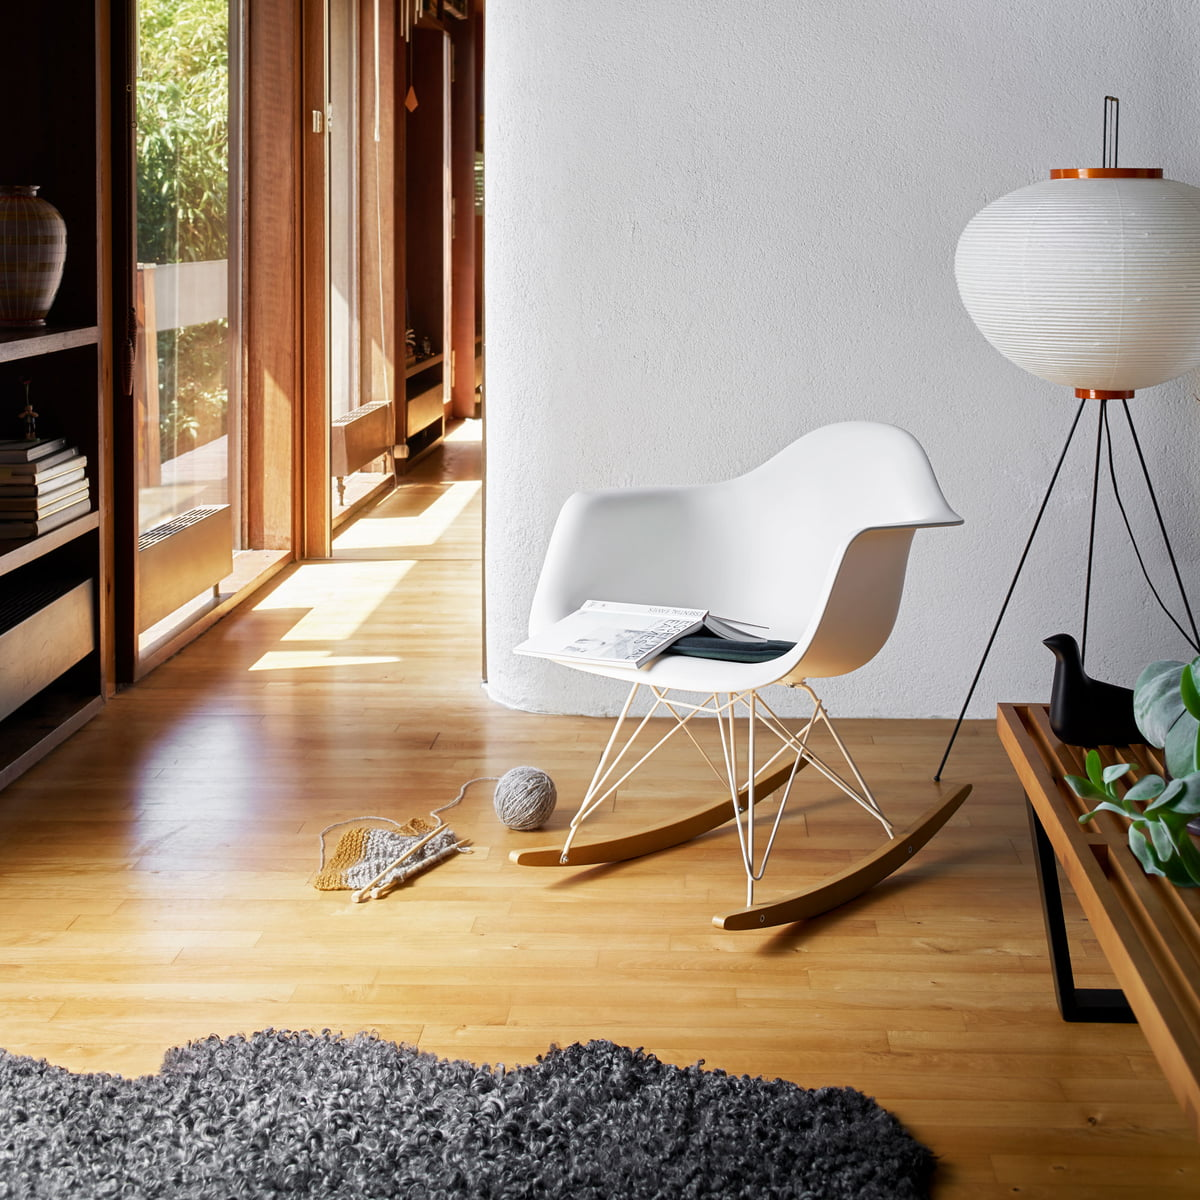 eames rar schaukelstuhl von vitra. Black Bedroom Furniture Sets. Home Design Ideas